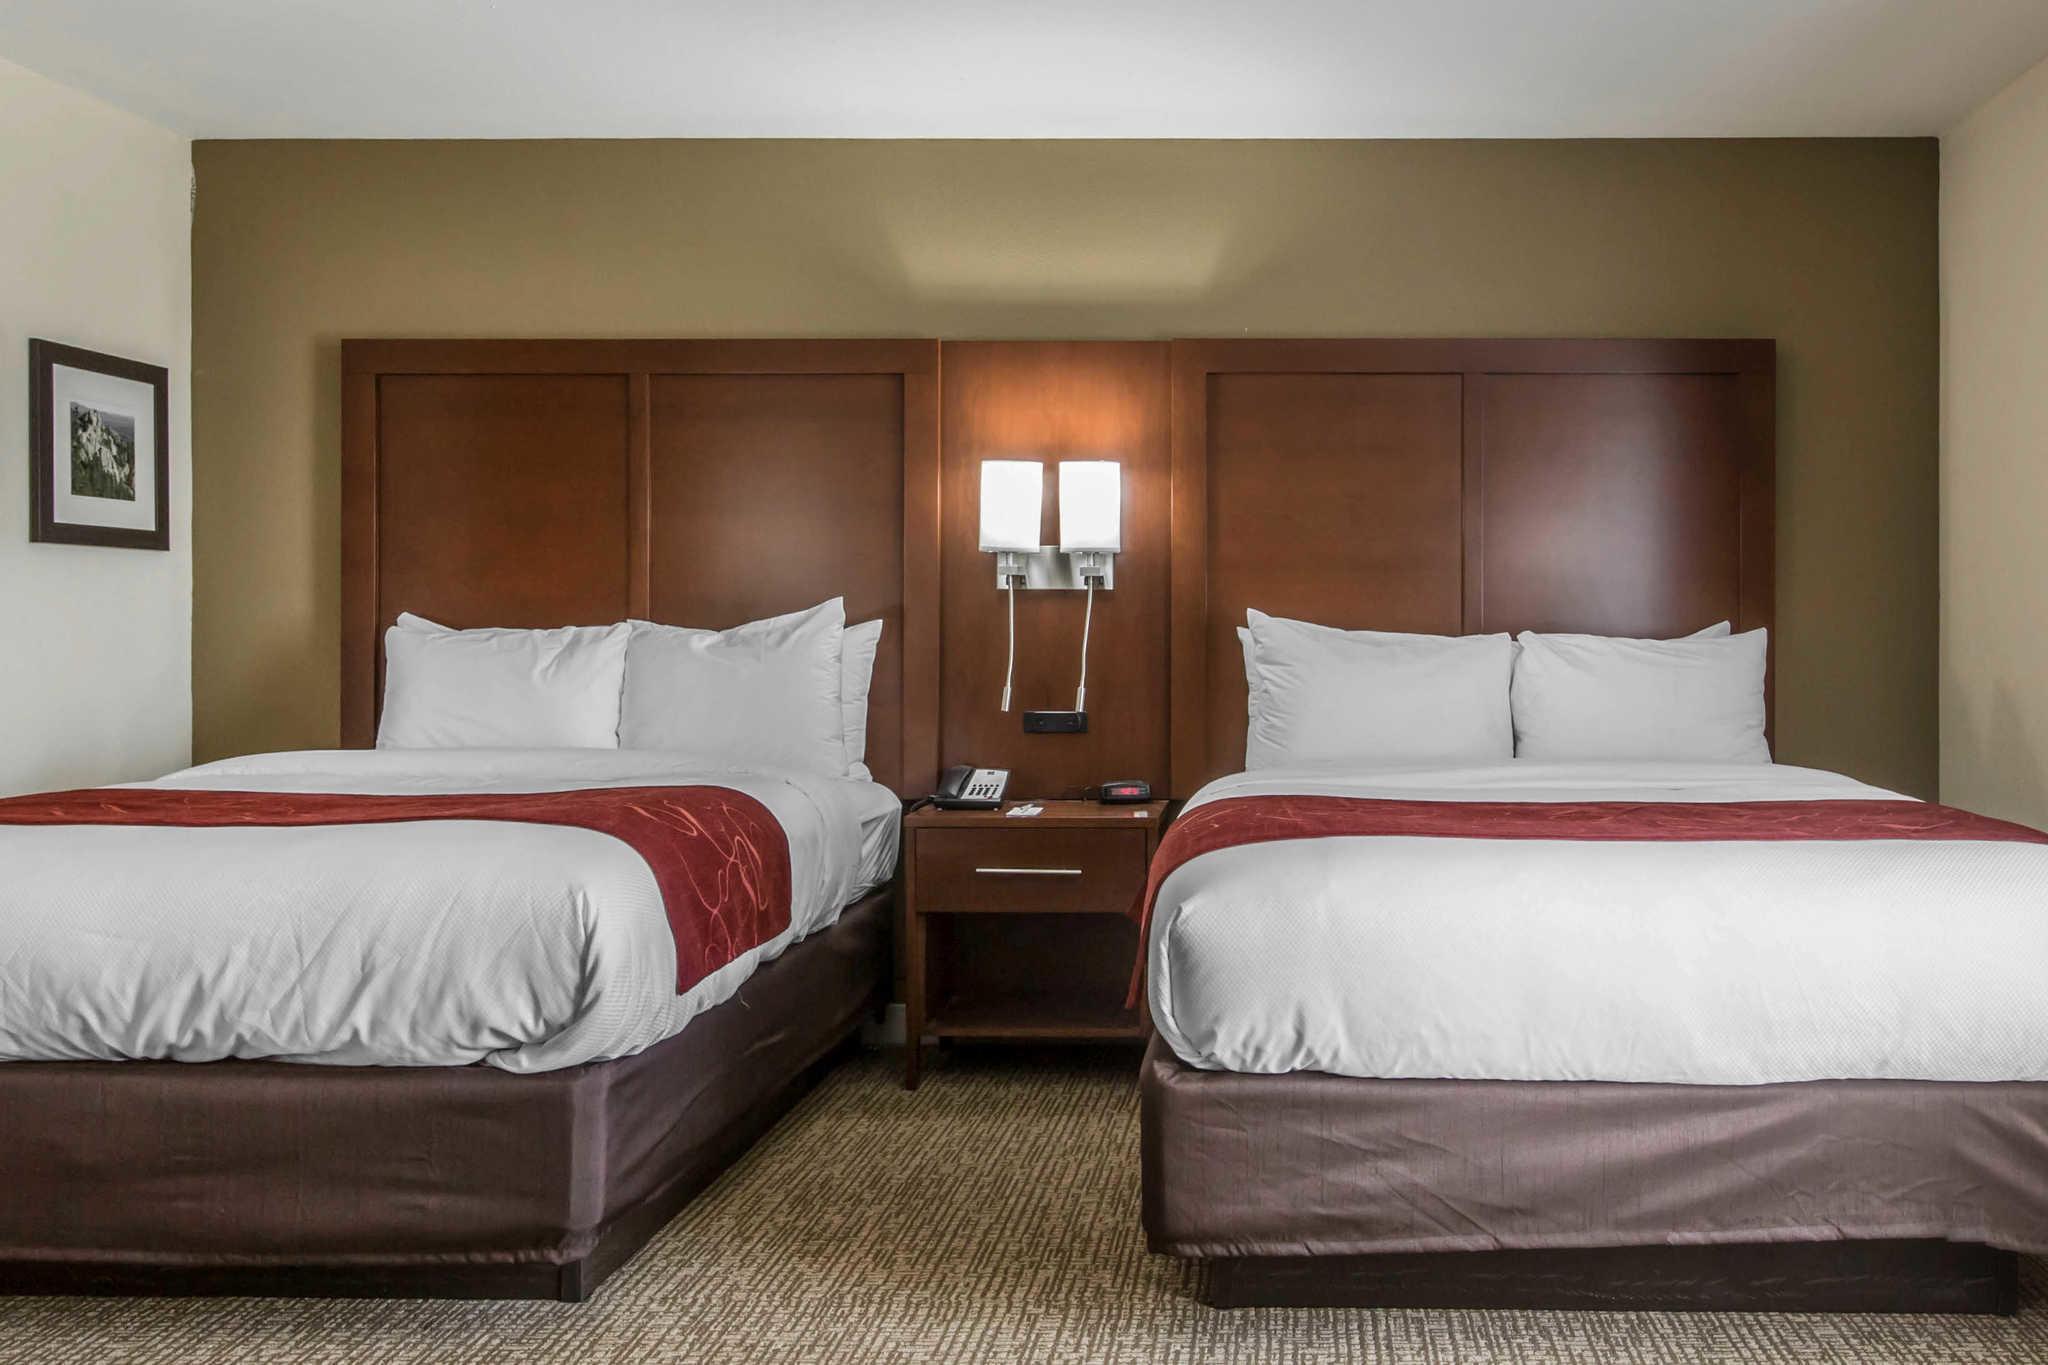 Comfort Inn & Suites West image 20